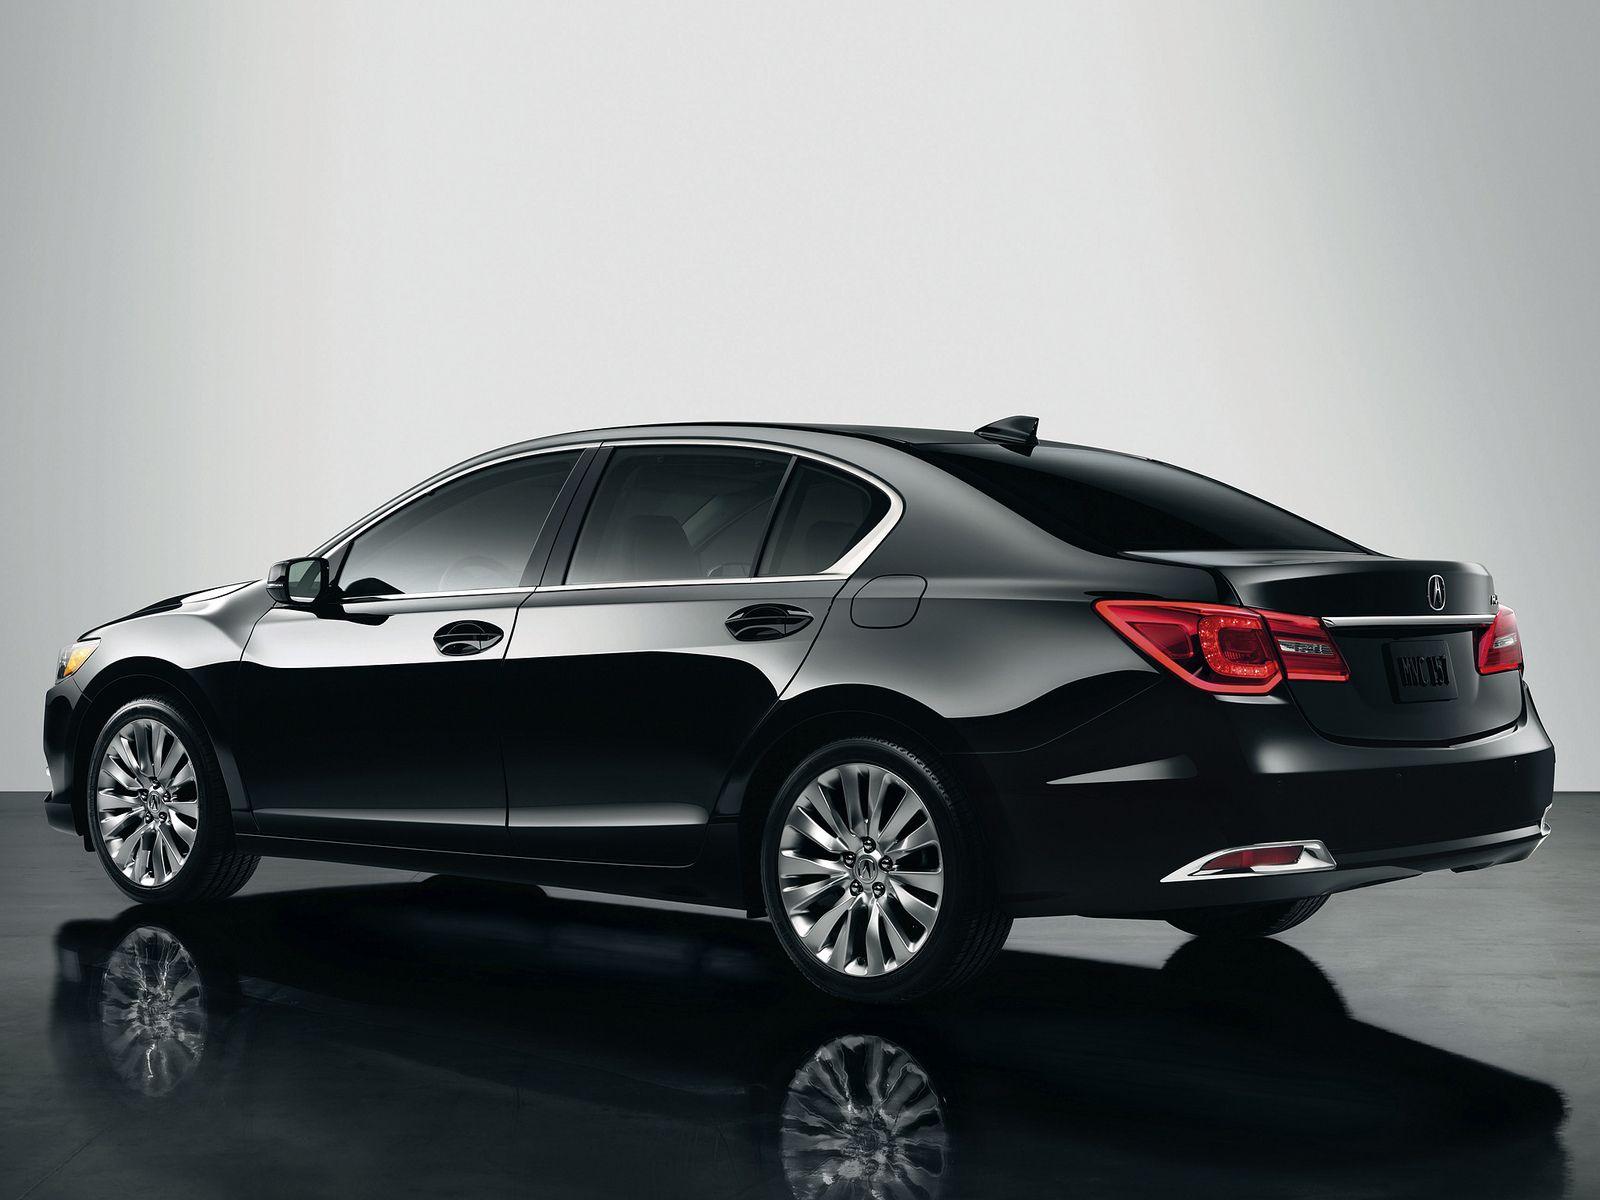 2014 Black Honda City Honda City Wallpapers Pinterest Cars